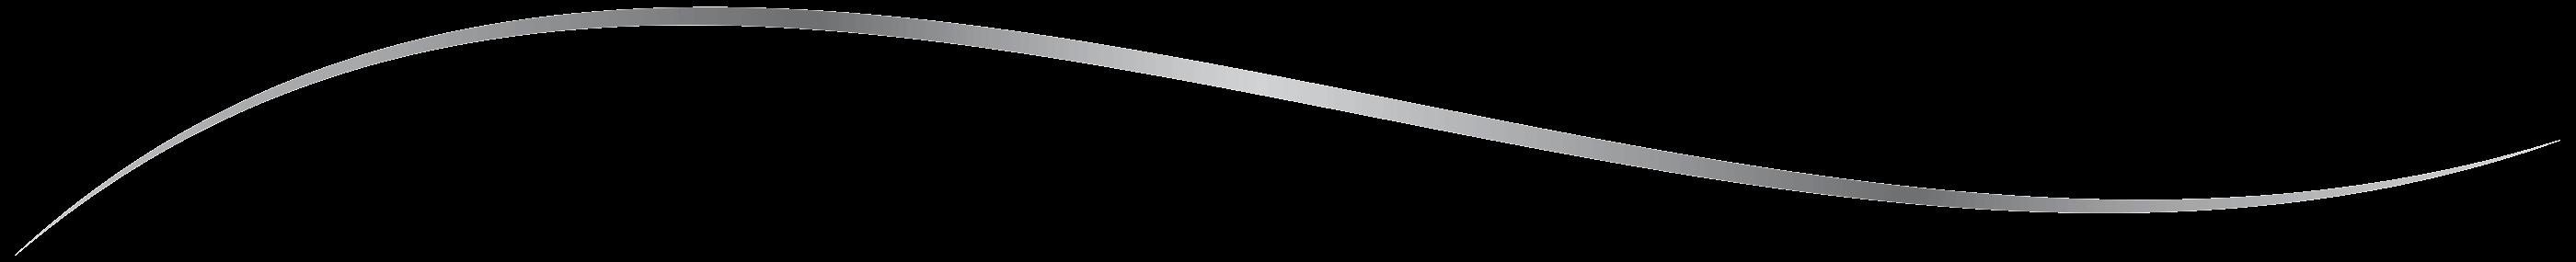 EI truth line gray